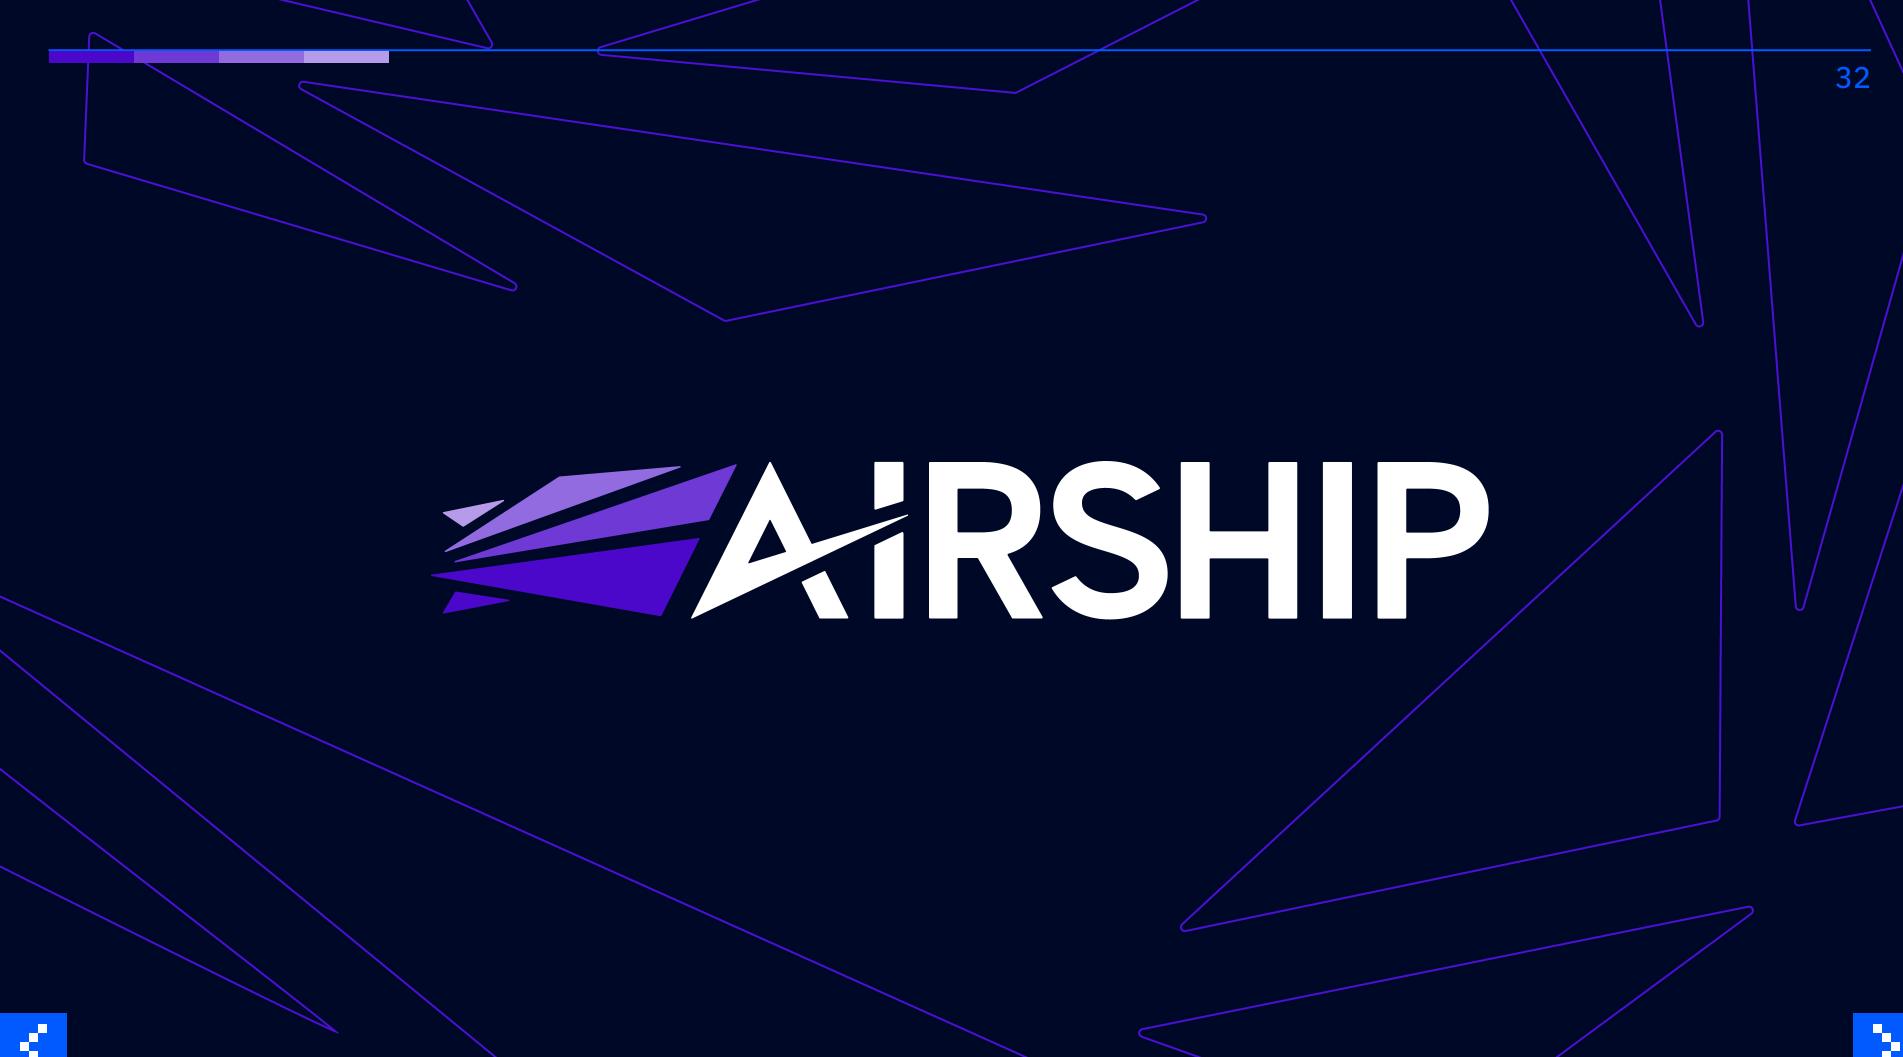 Airship Images | Mobile responsive website design